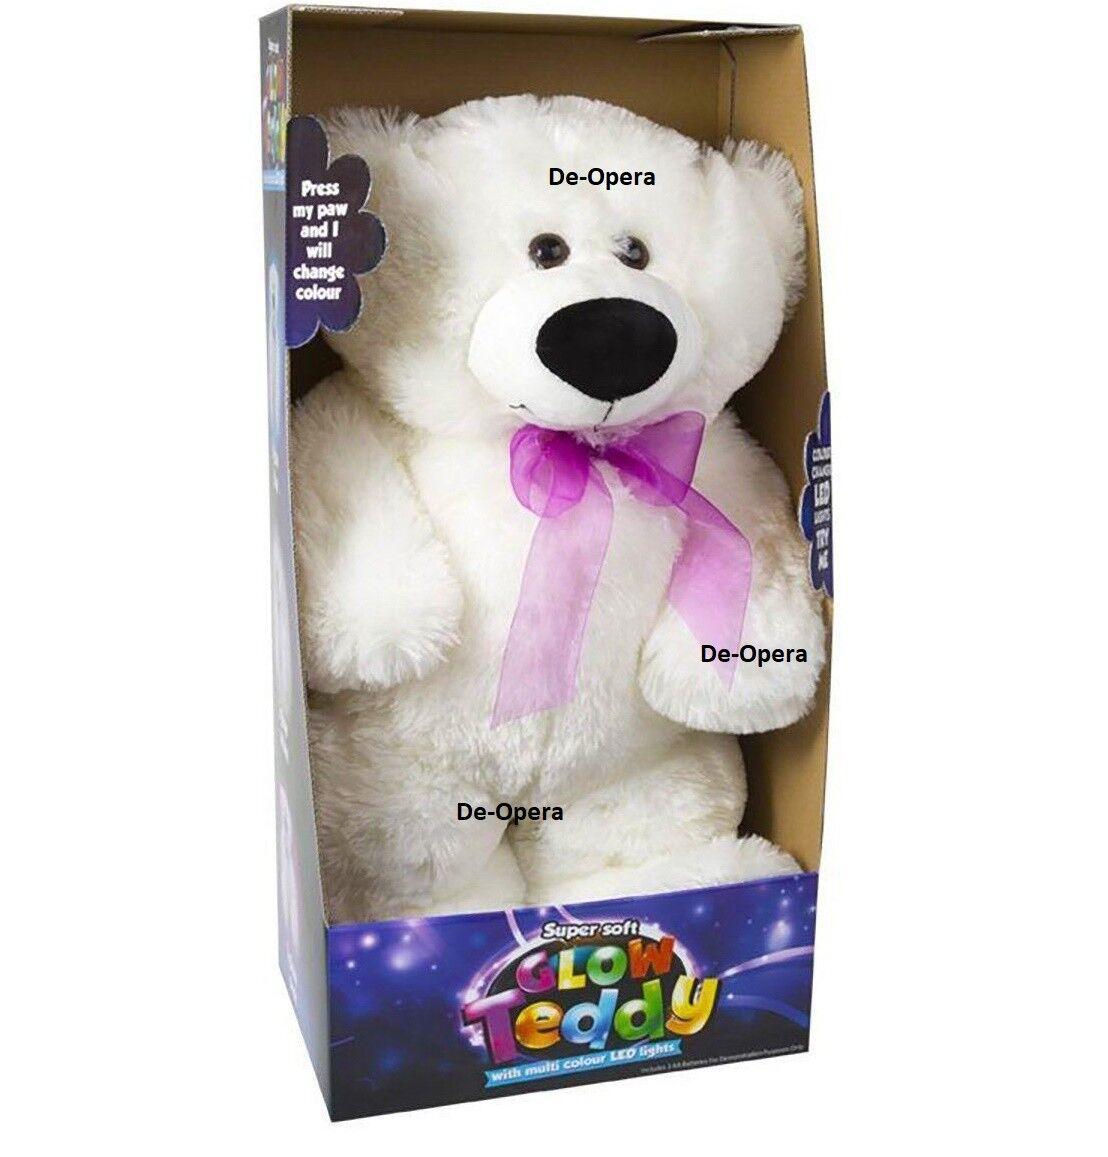 Miri Moo Super Soft Glow Teddy Bear Changing Colours Led Night Light Cuddly Toy